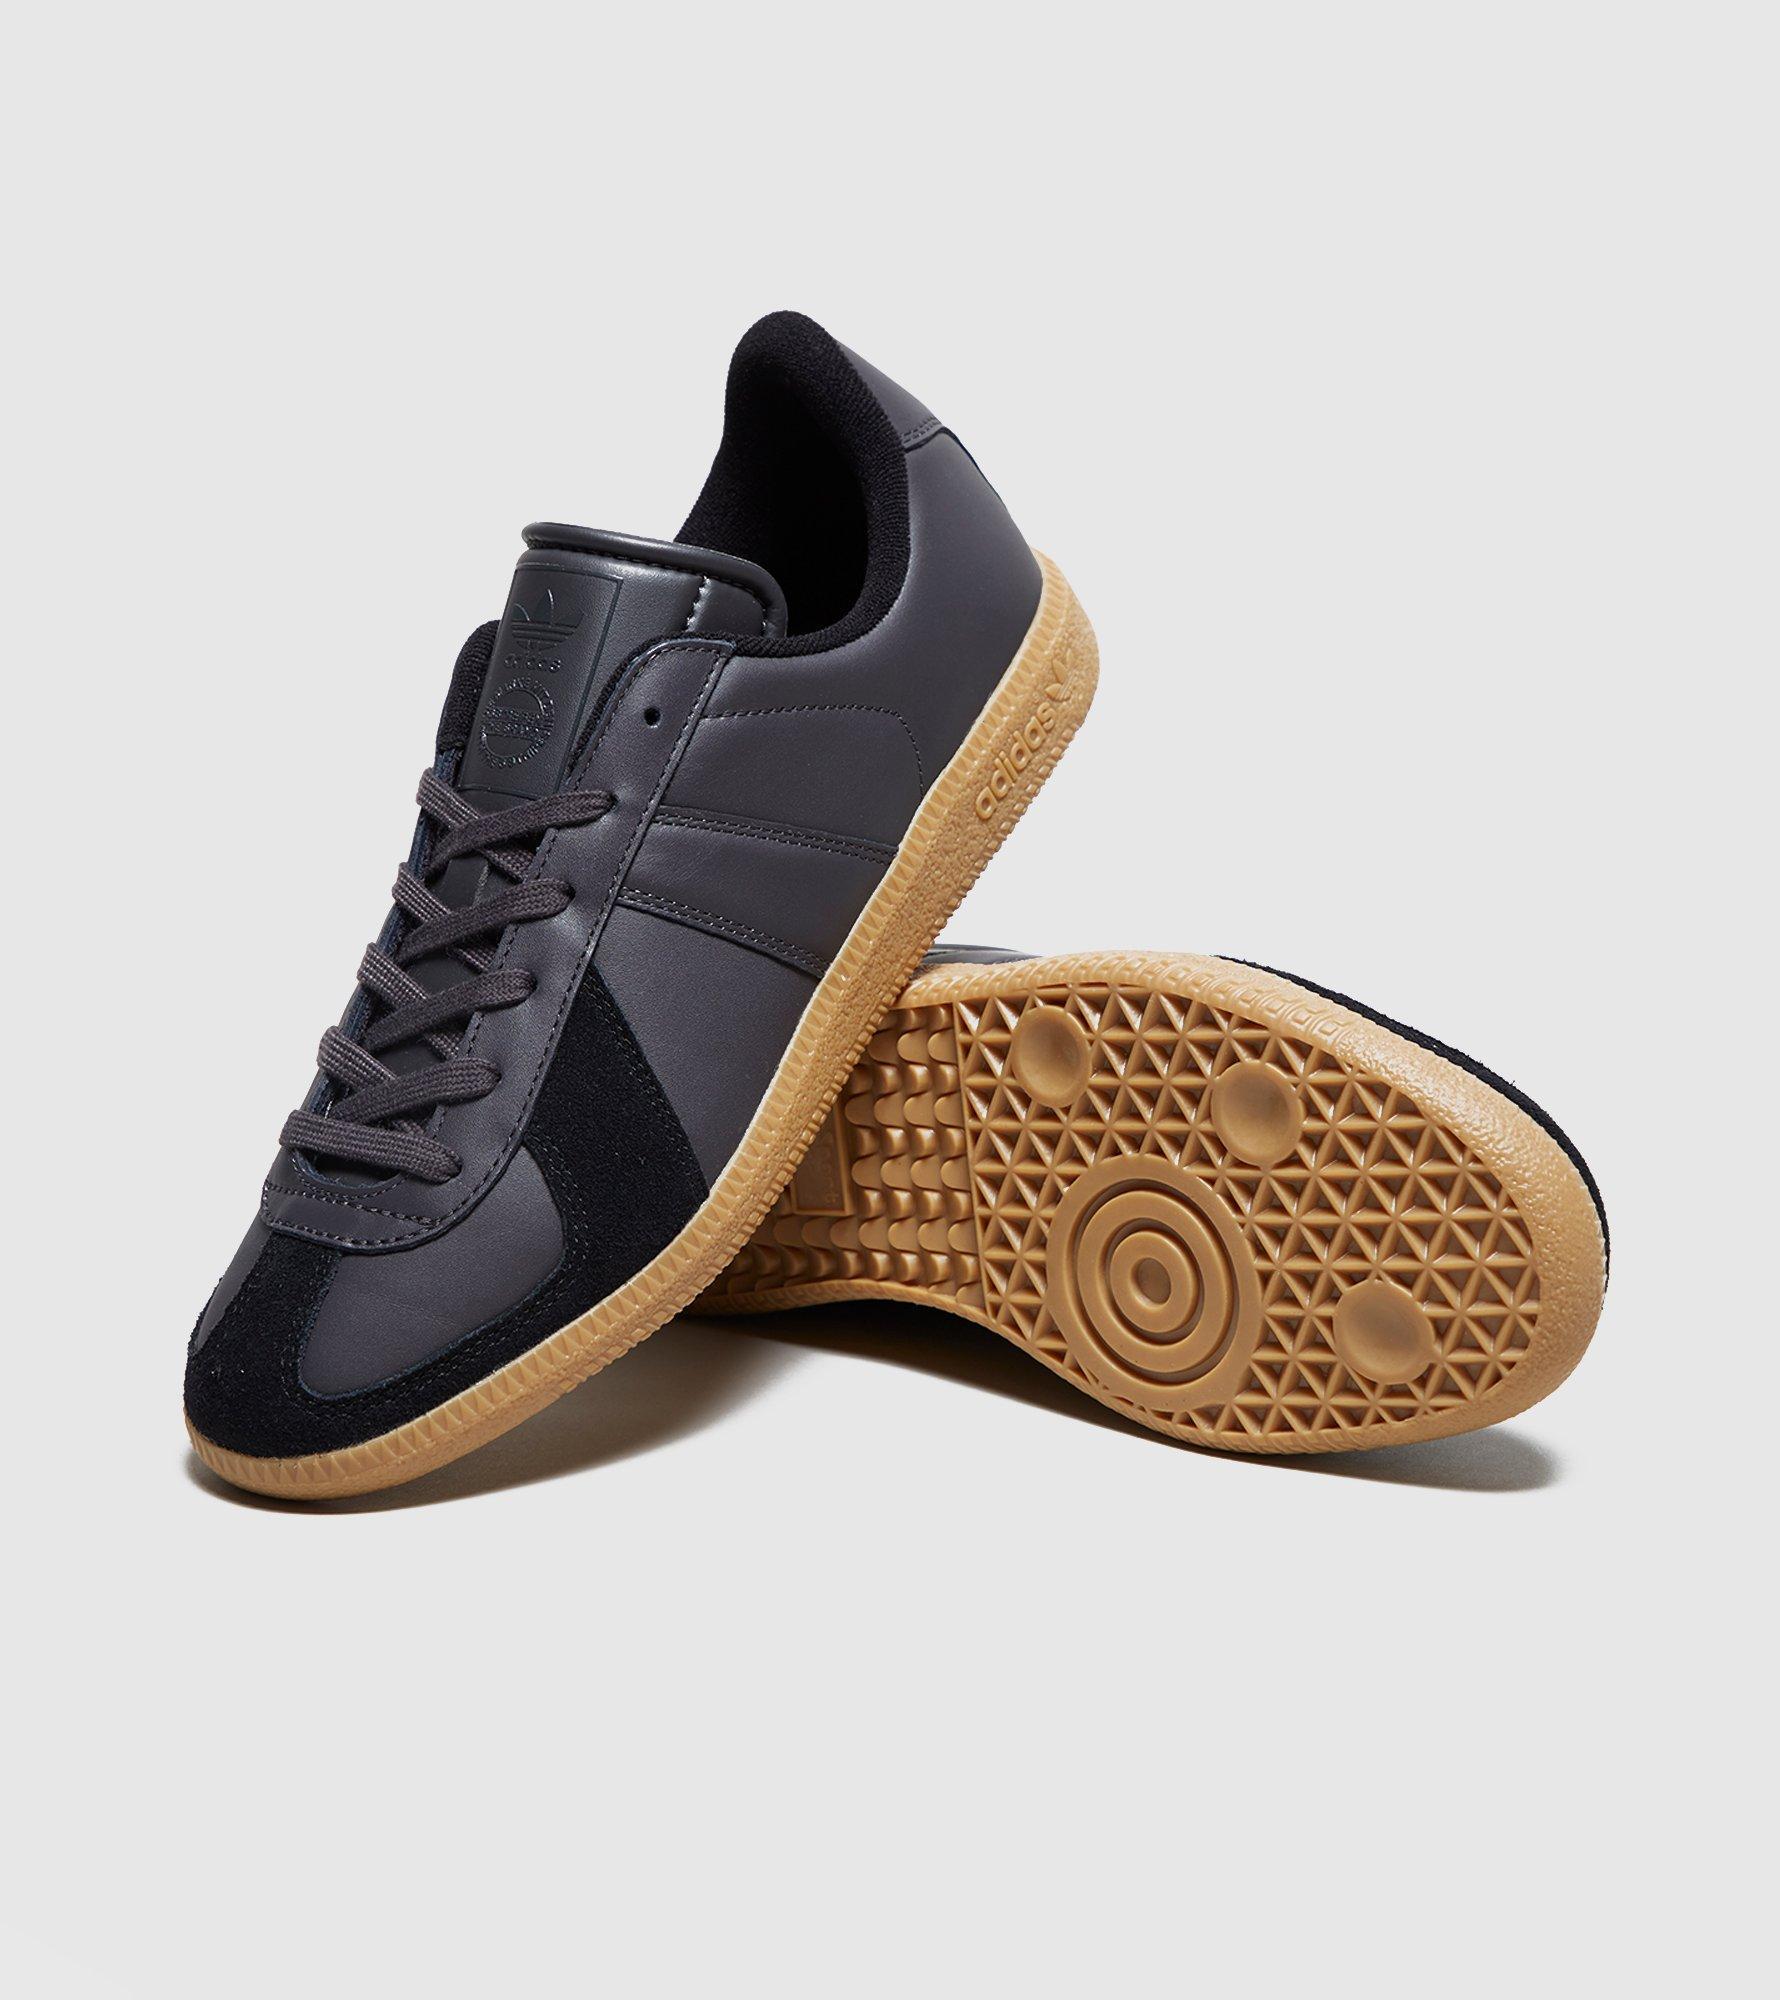 92b5a6d4ab6 adidas Originals Bw Army Clean in Black for Men - Lyst